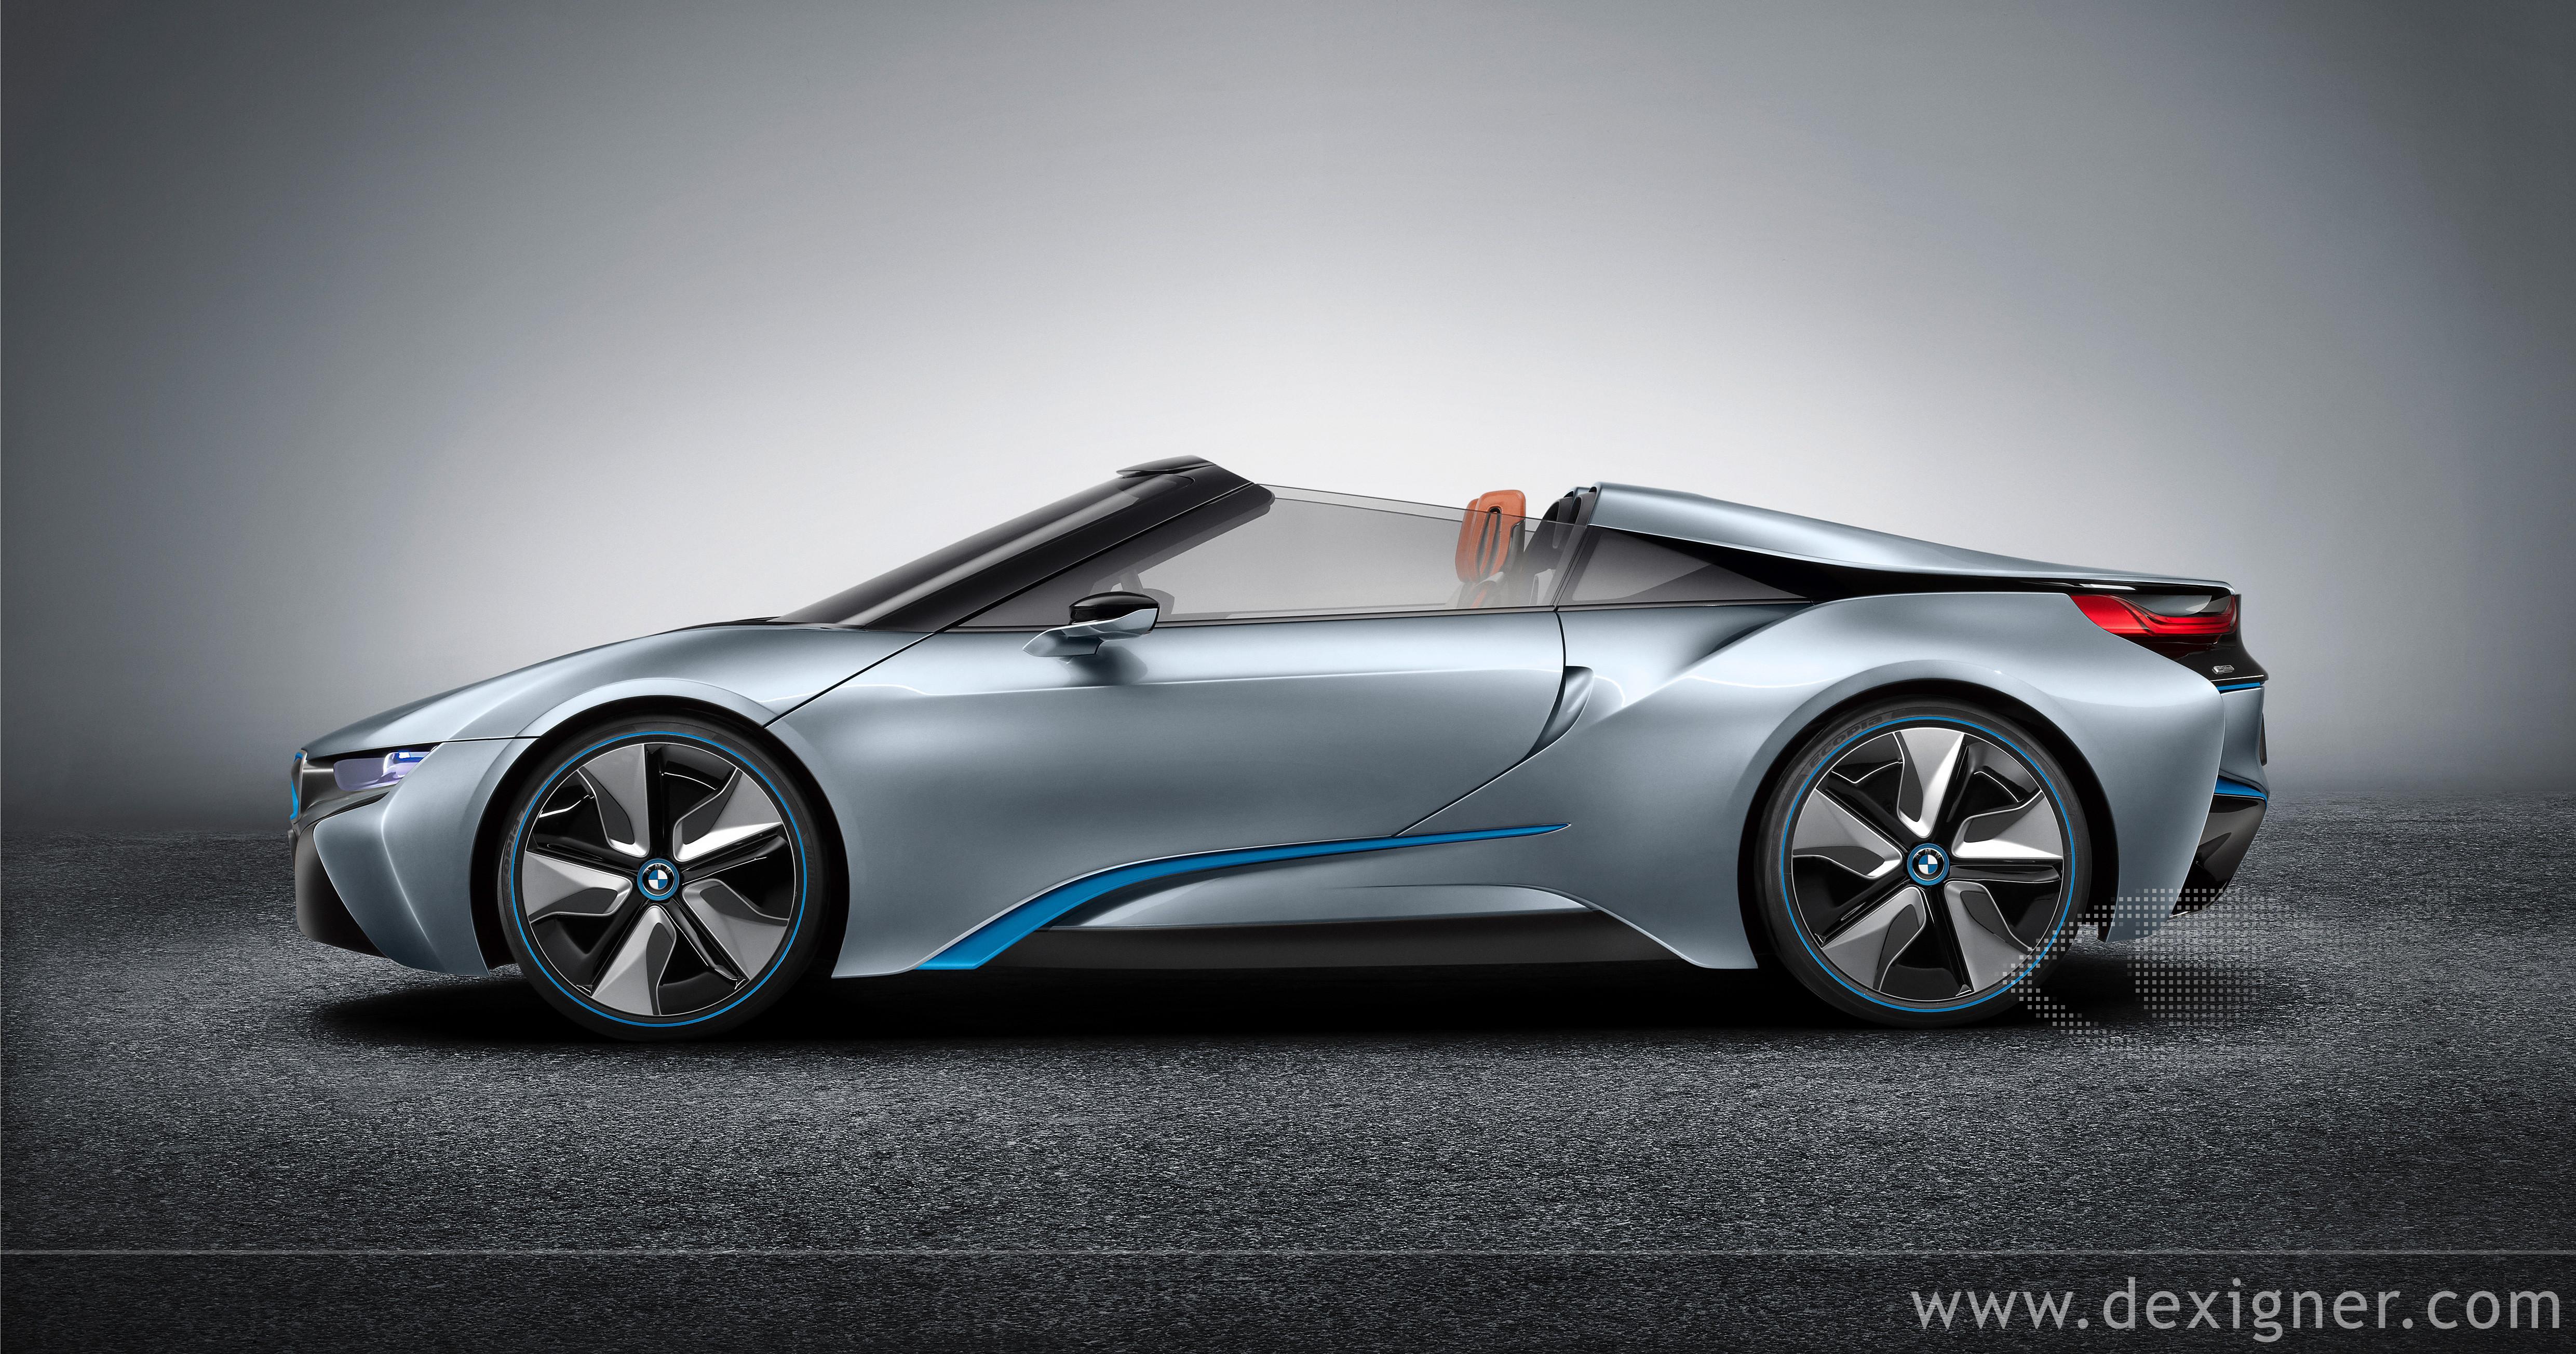 BMW_i8_Concept_Spyder_04.jpg (4961×2608)